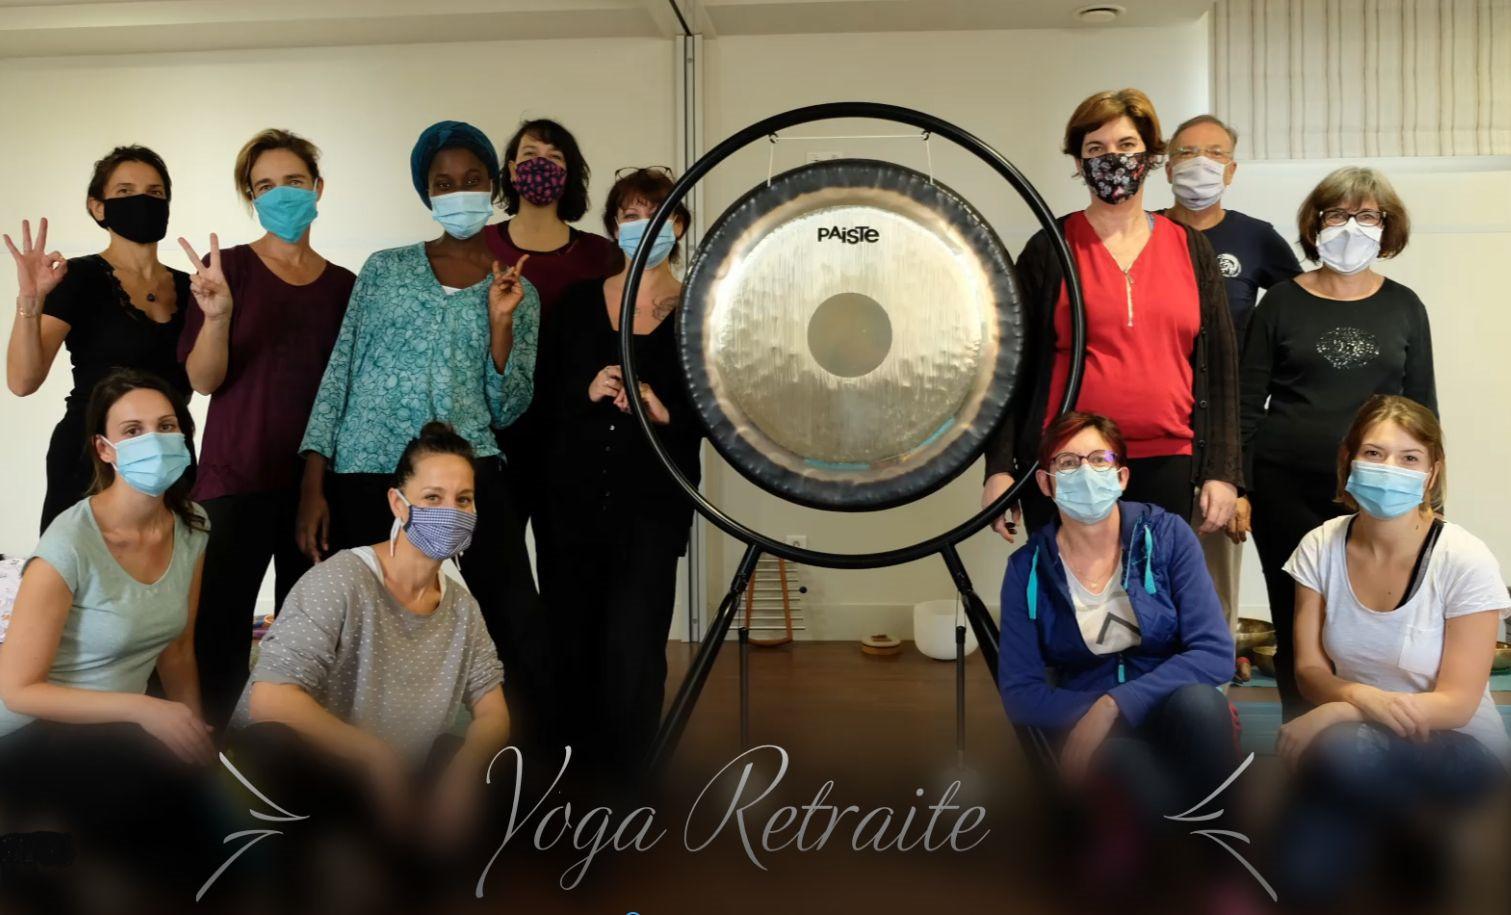 Yoga Retraite 2020 La Neyliere.jpg